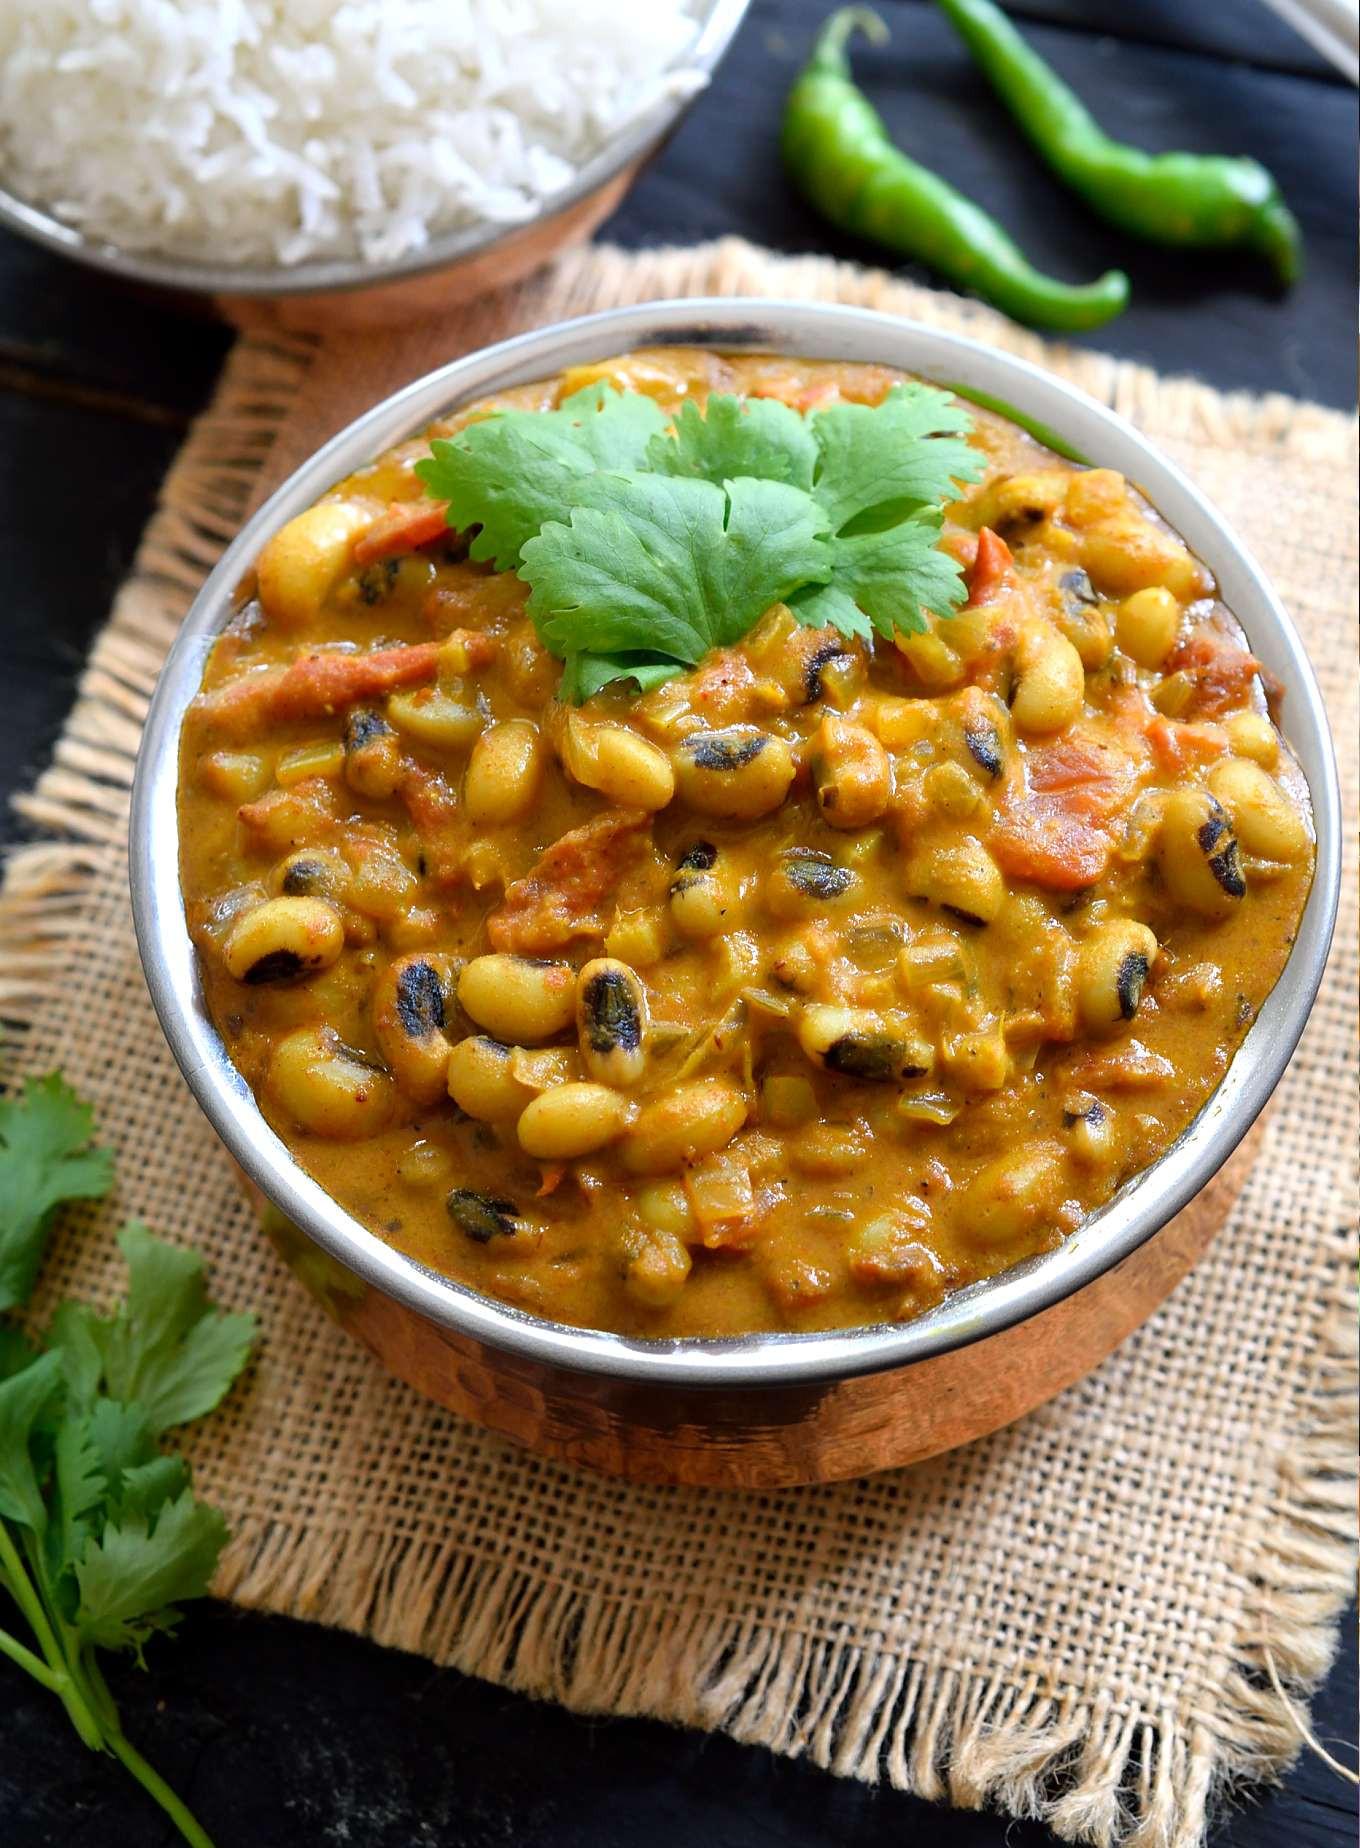 Vegan Black Eyed Pea Recipes  Curried Ve arian Black Eyed Peas Recipe